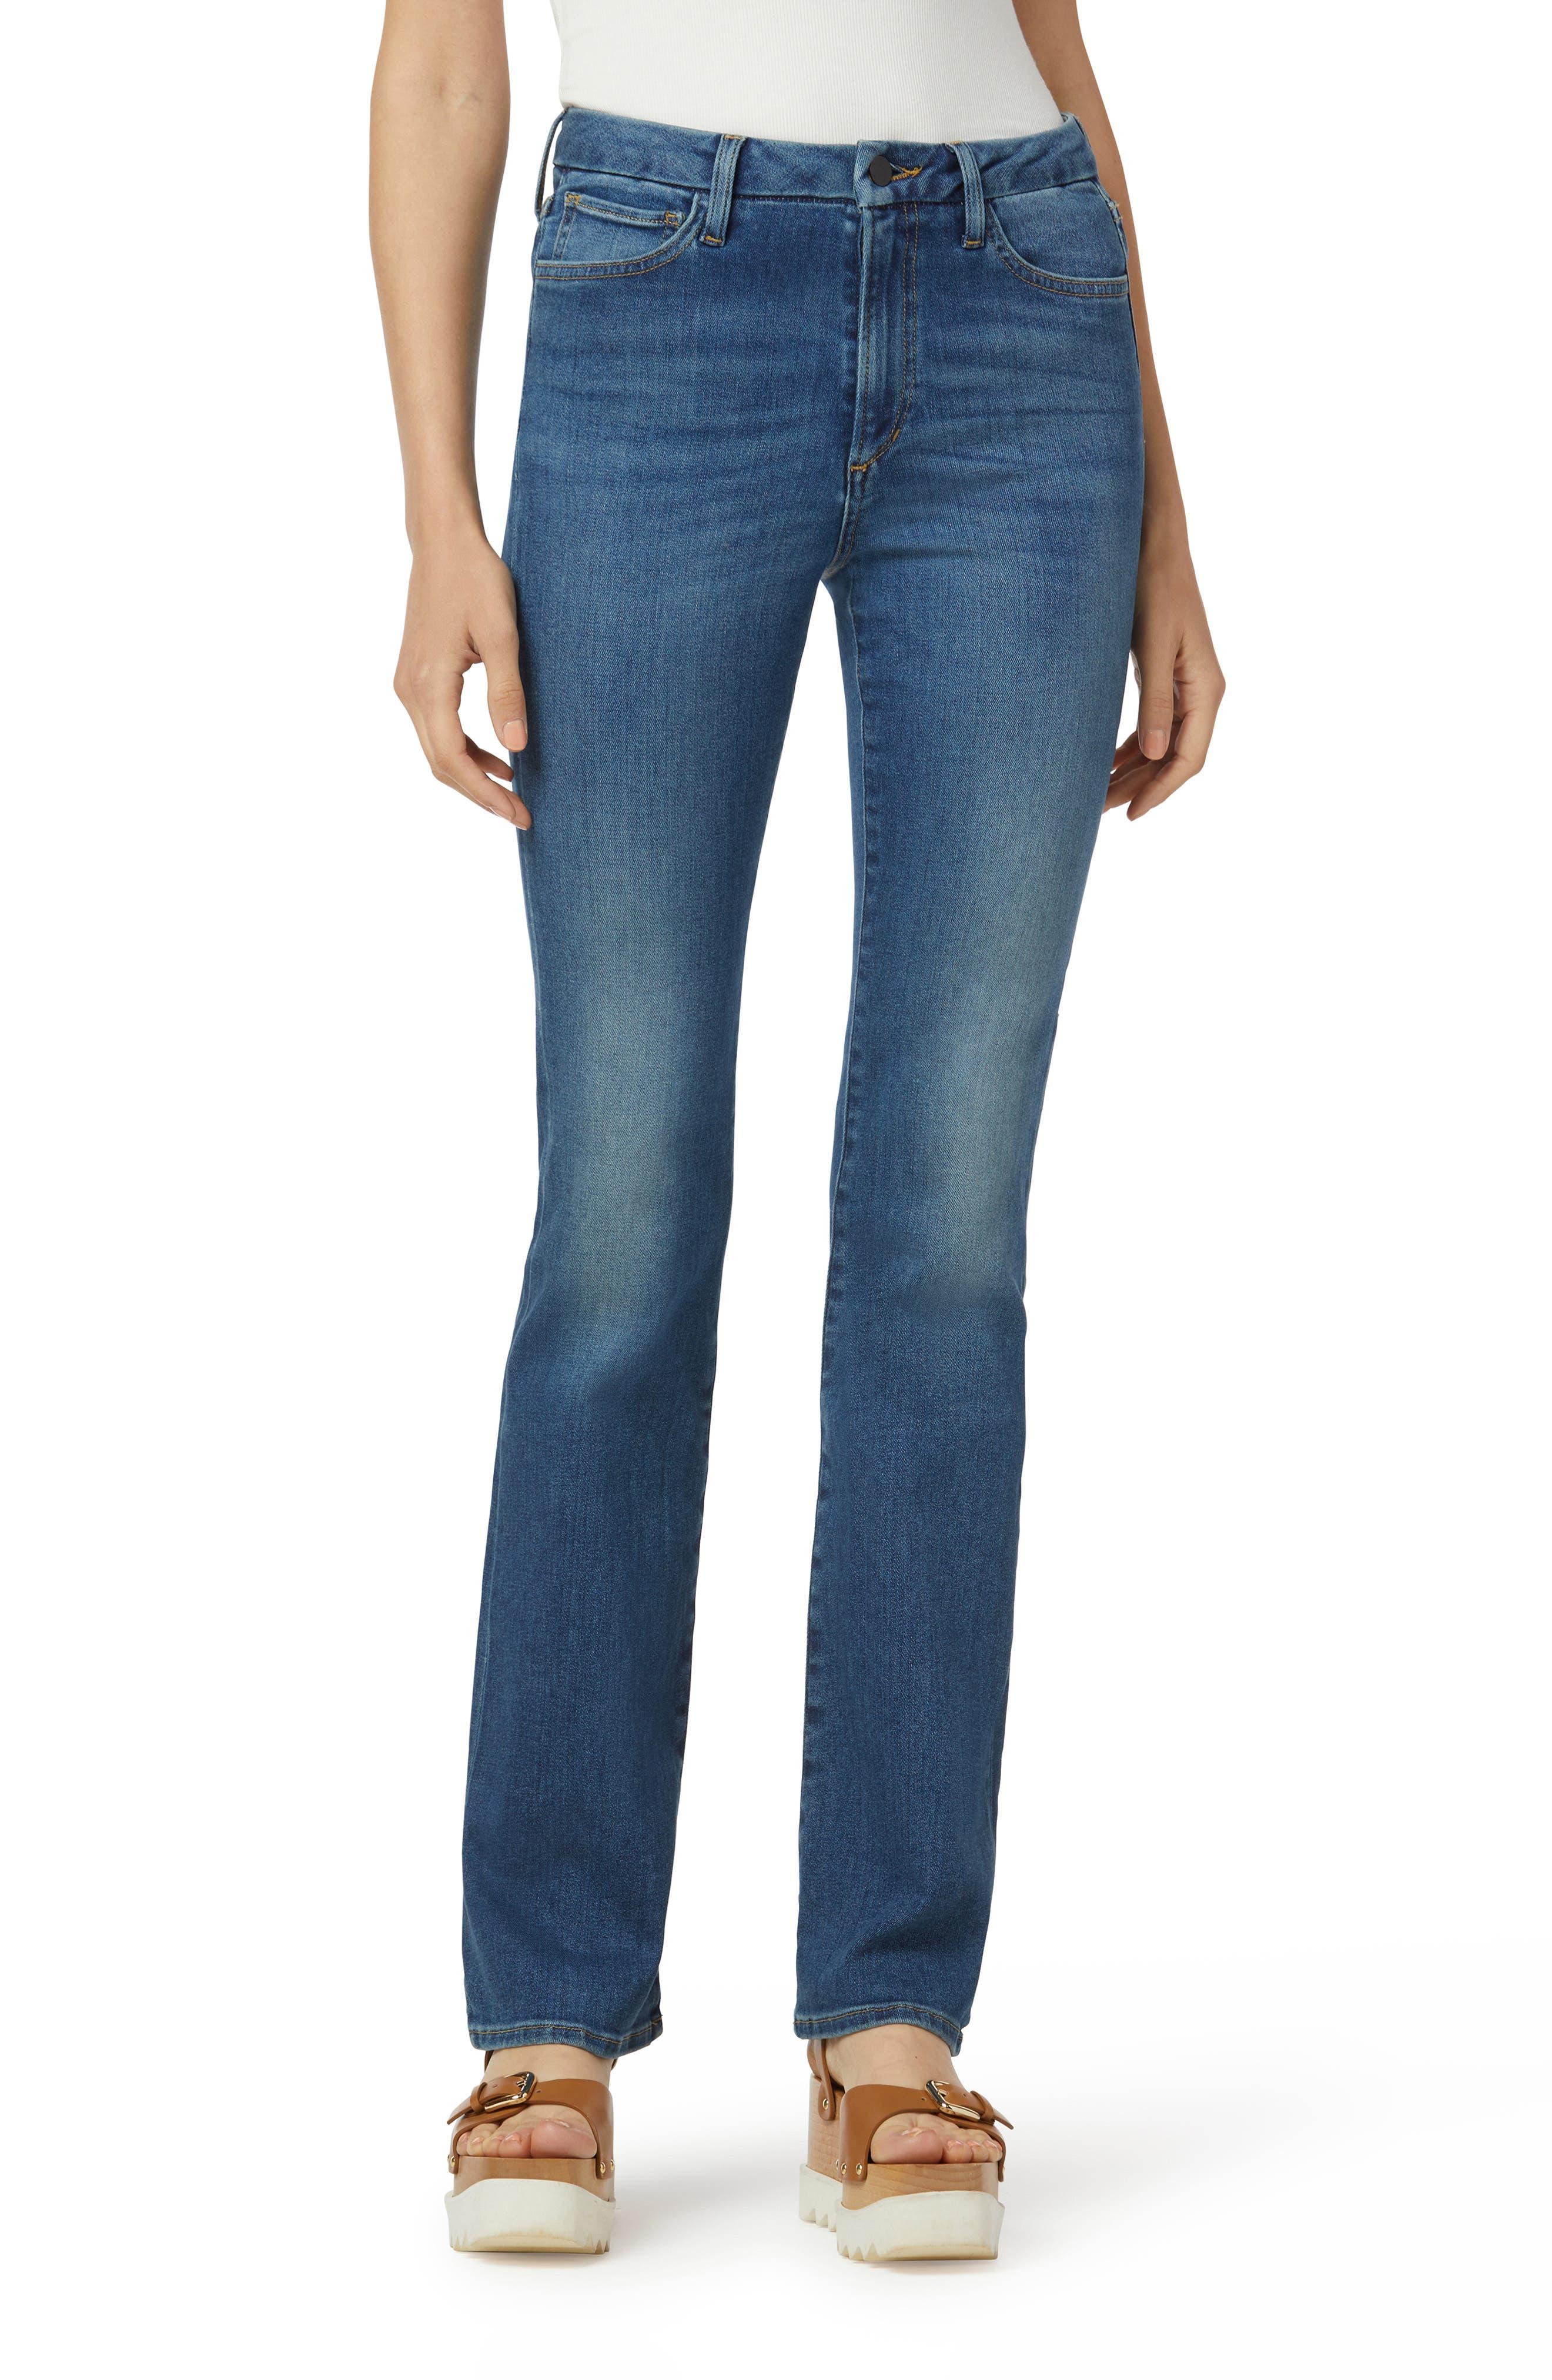 The Hi Honey High Waist Stretch Organic Cotton Bootcut Jeans